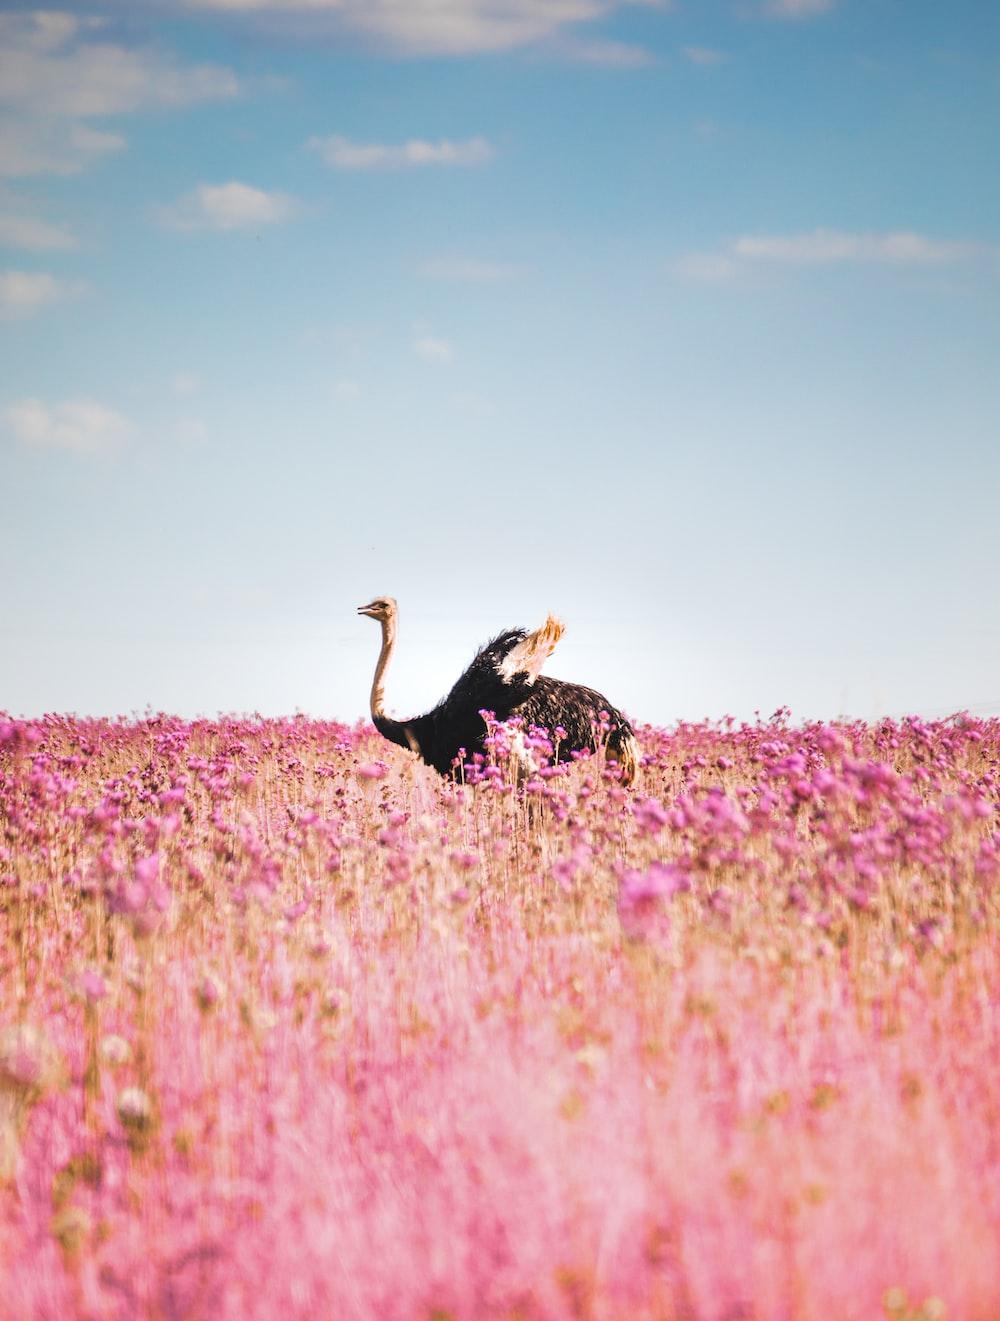 black and white turkey on pink flower field under blue sky during daytime